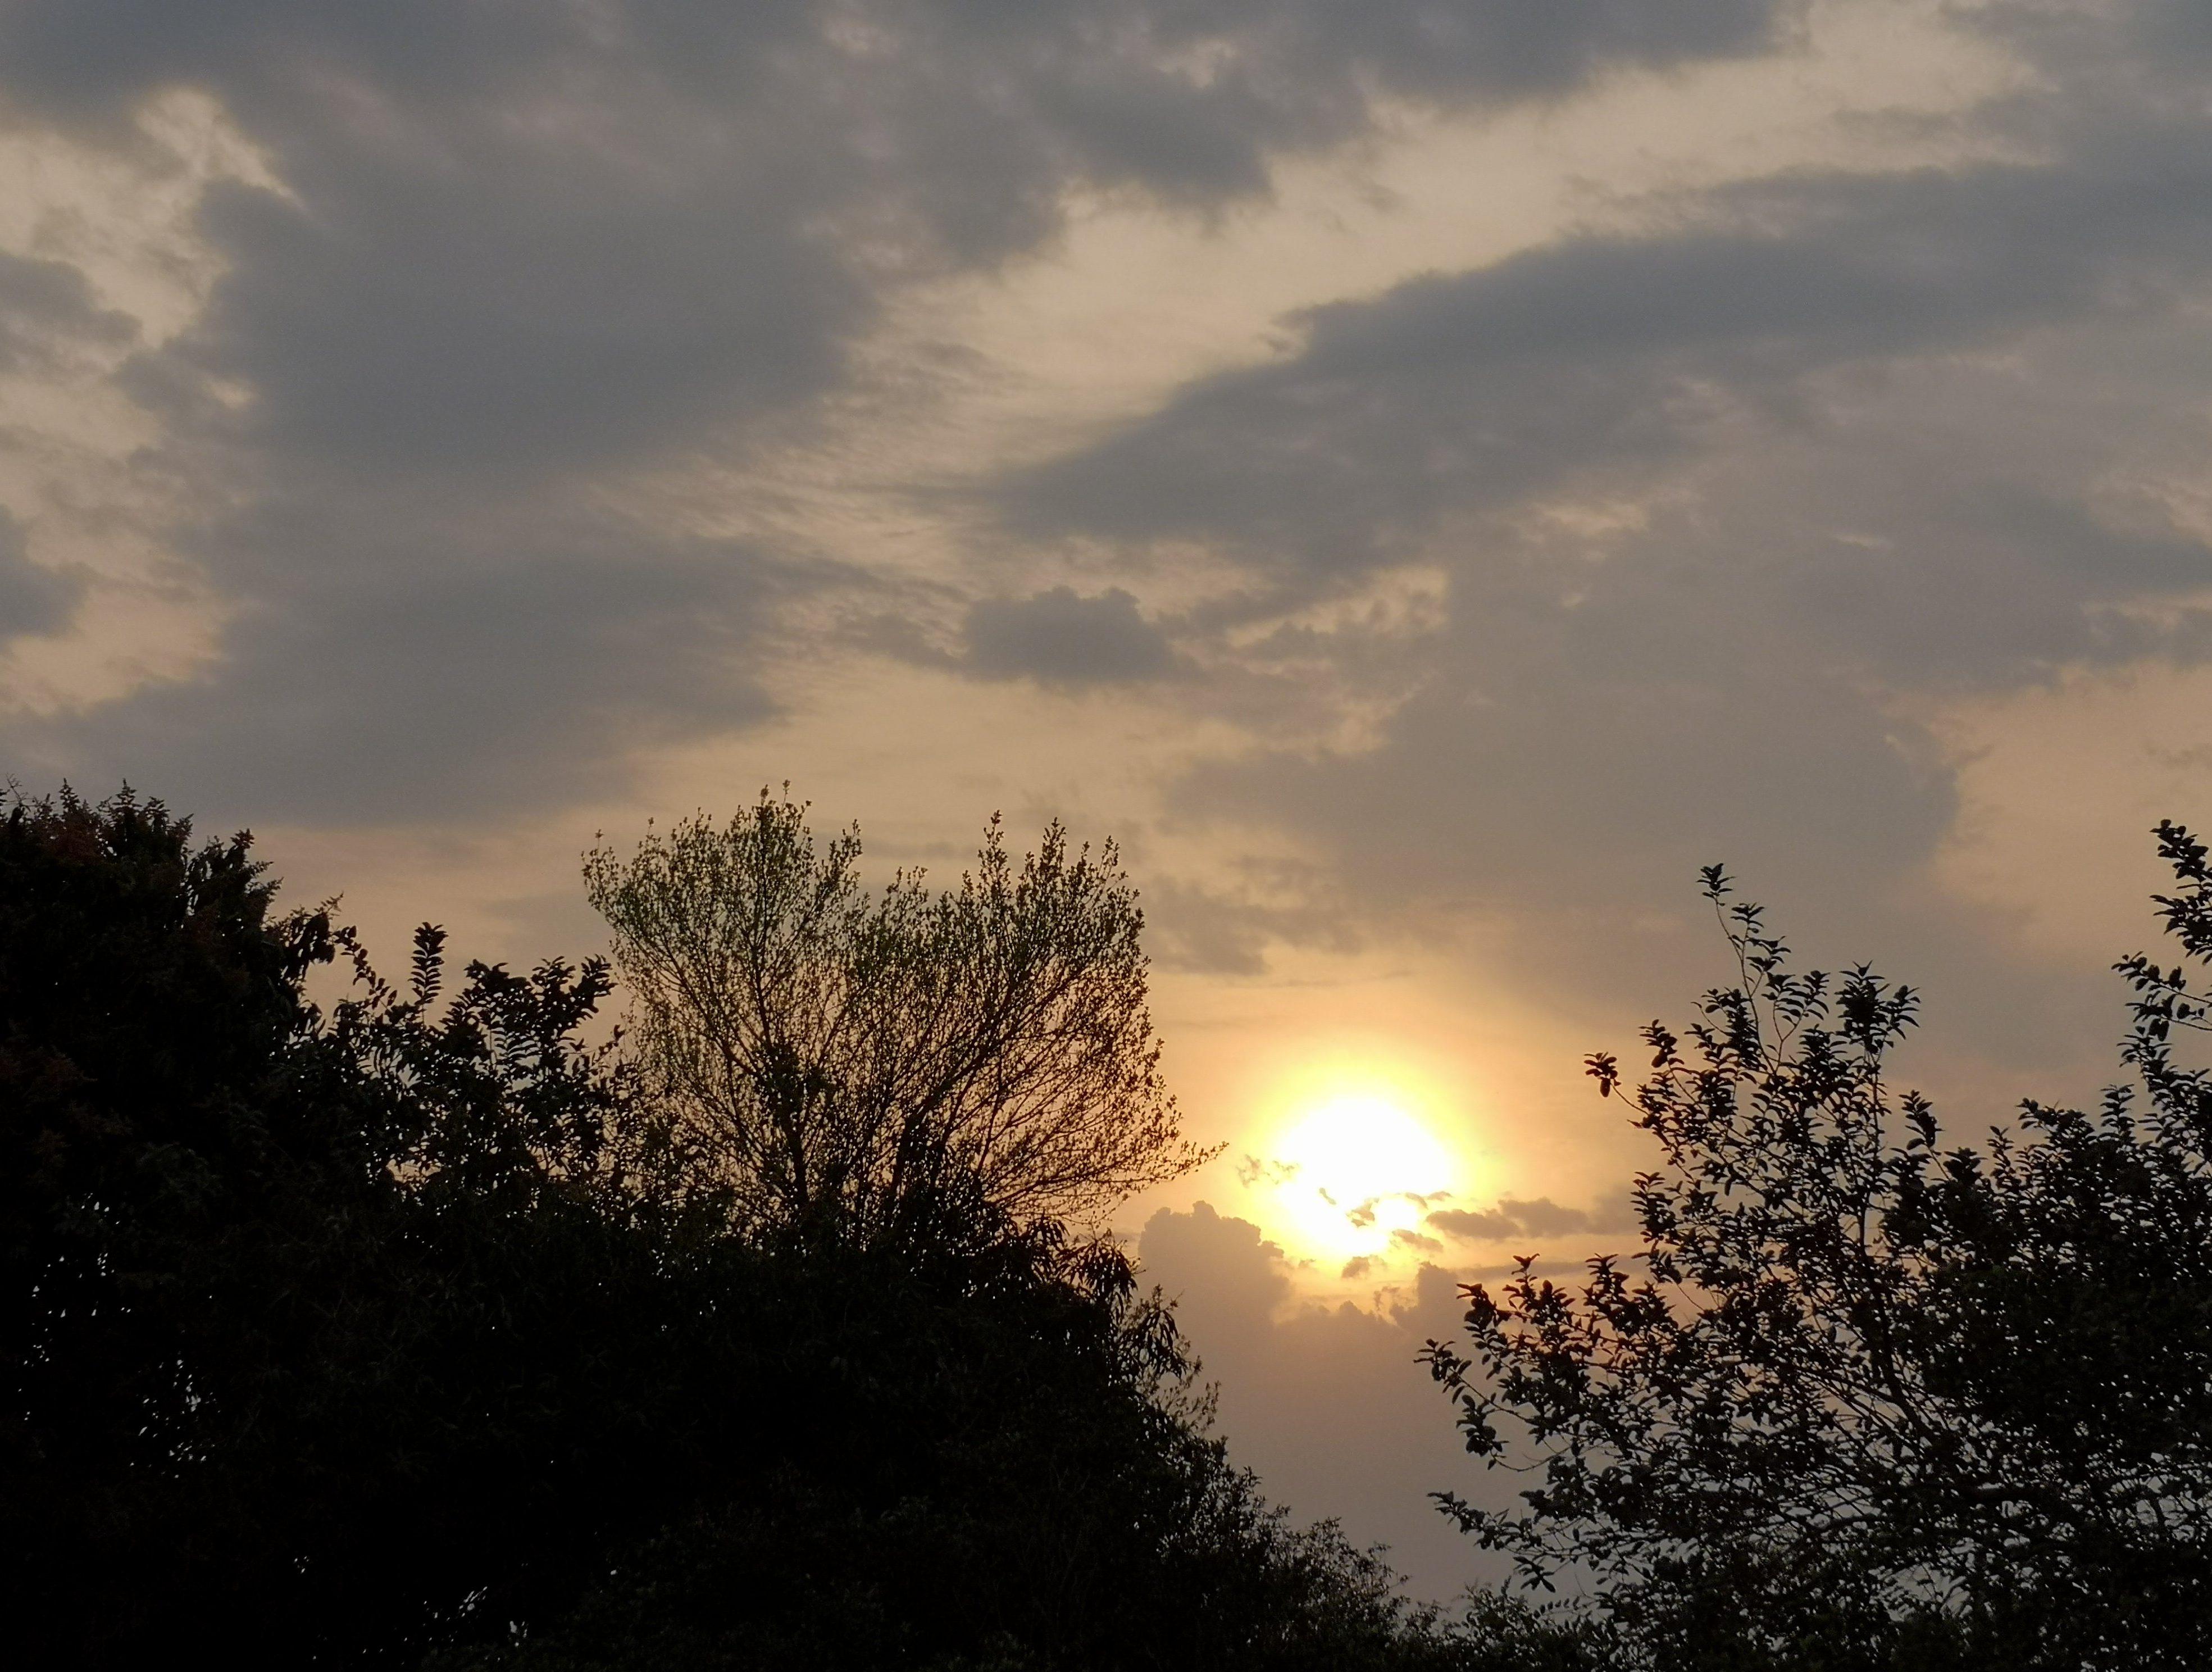 clima ambiente nubes sol calor calido humo bruma 05